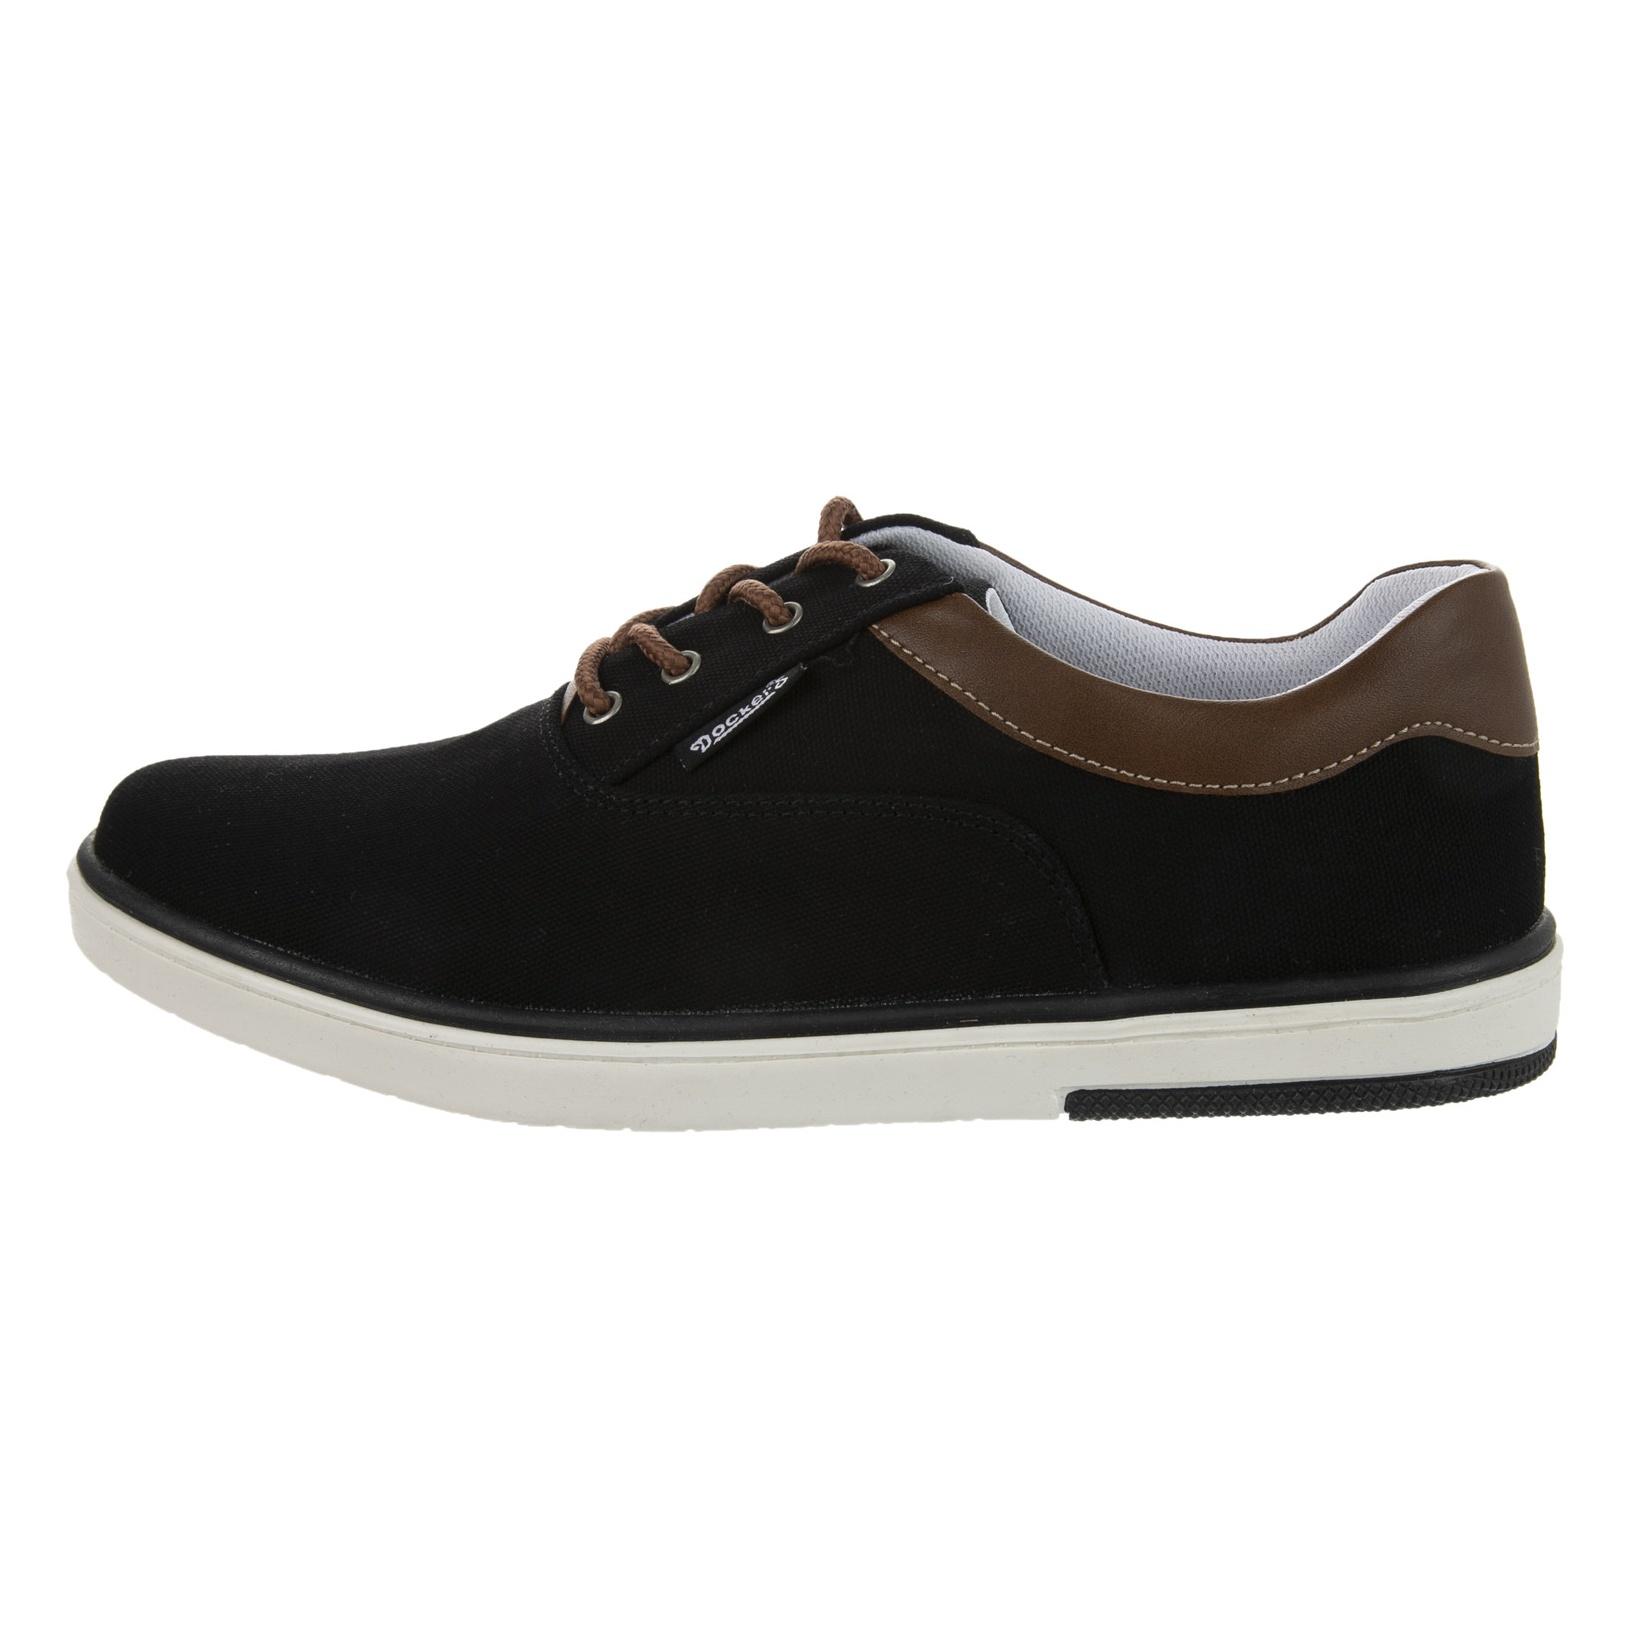 کفش روزمره مردانه داکرز مدل 100234016-BL -  - 1